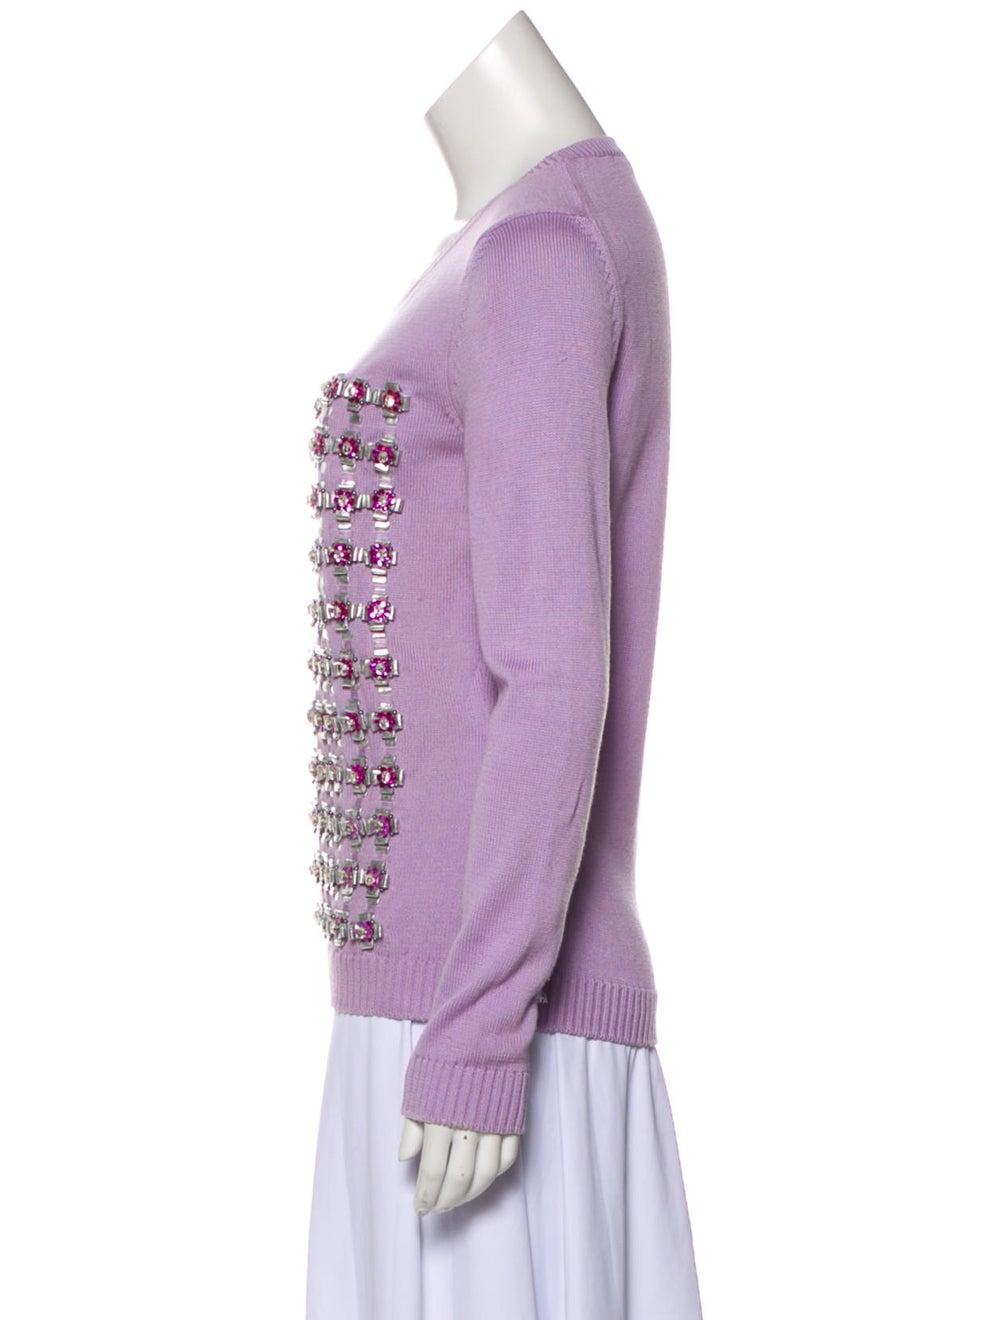 Mary Katrantzou Embroidered Knit Sweater - image 2